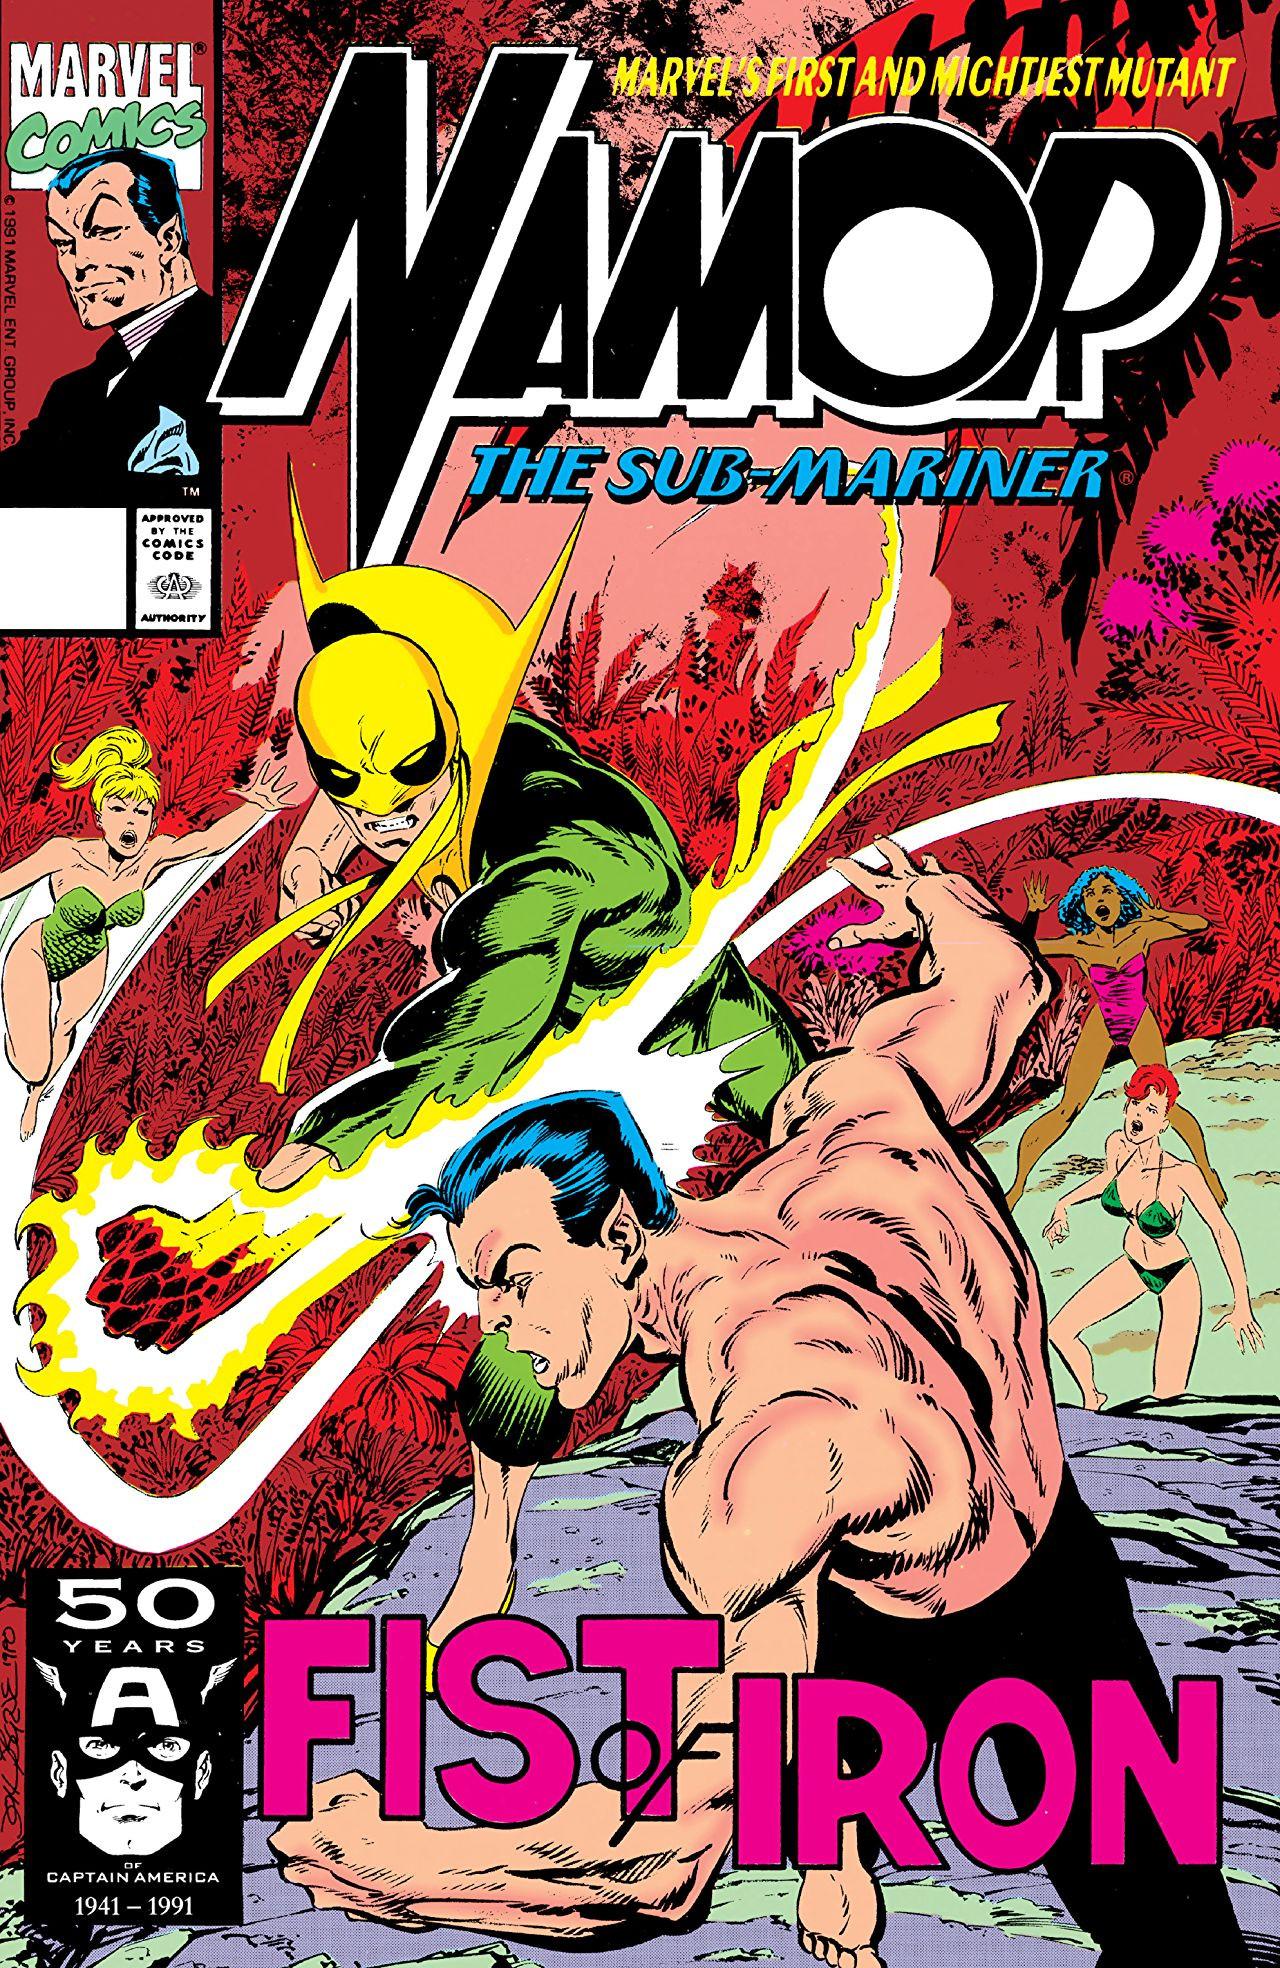 Namor the Sub-Mariner Vol 1 16.jpg